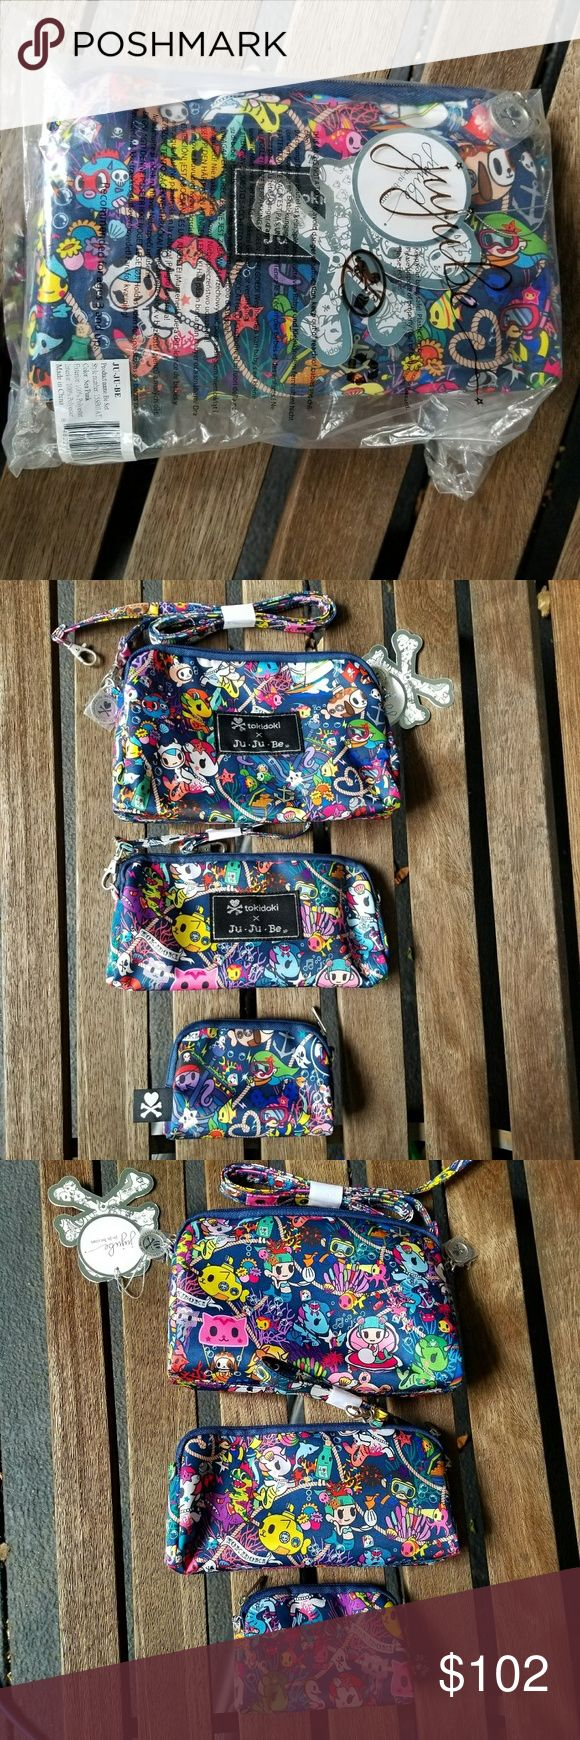 Tokidoki JuJuBe Sea Punk Be Set 3 Bag Set, Motzarella lovers rejoice, got Romantico & Perla too. NWT, in Bag only taken out for pics. tokidoki JuJuBe Bags Mini Bags